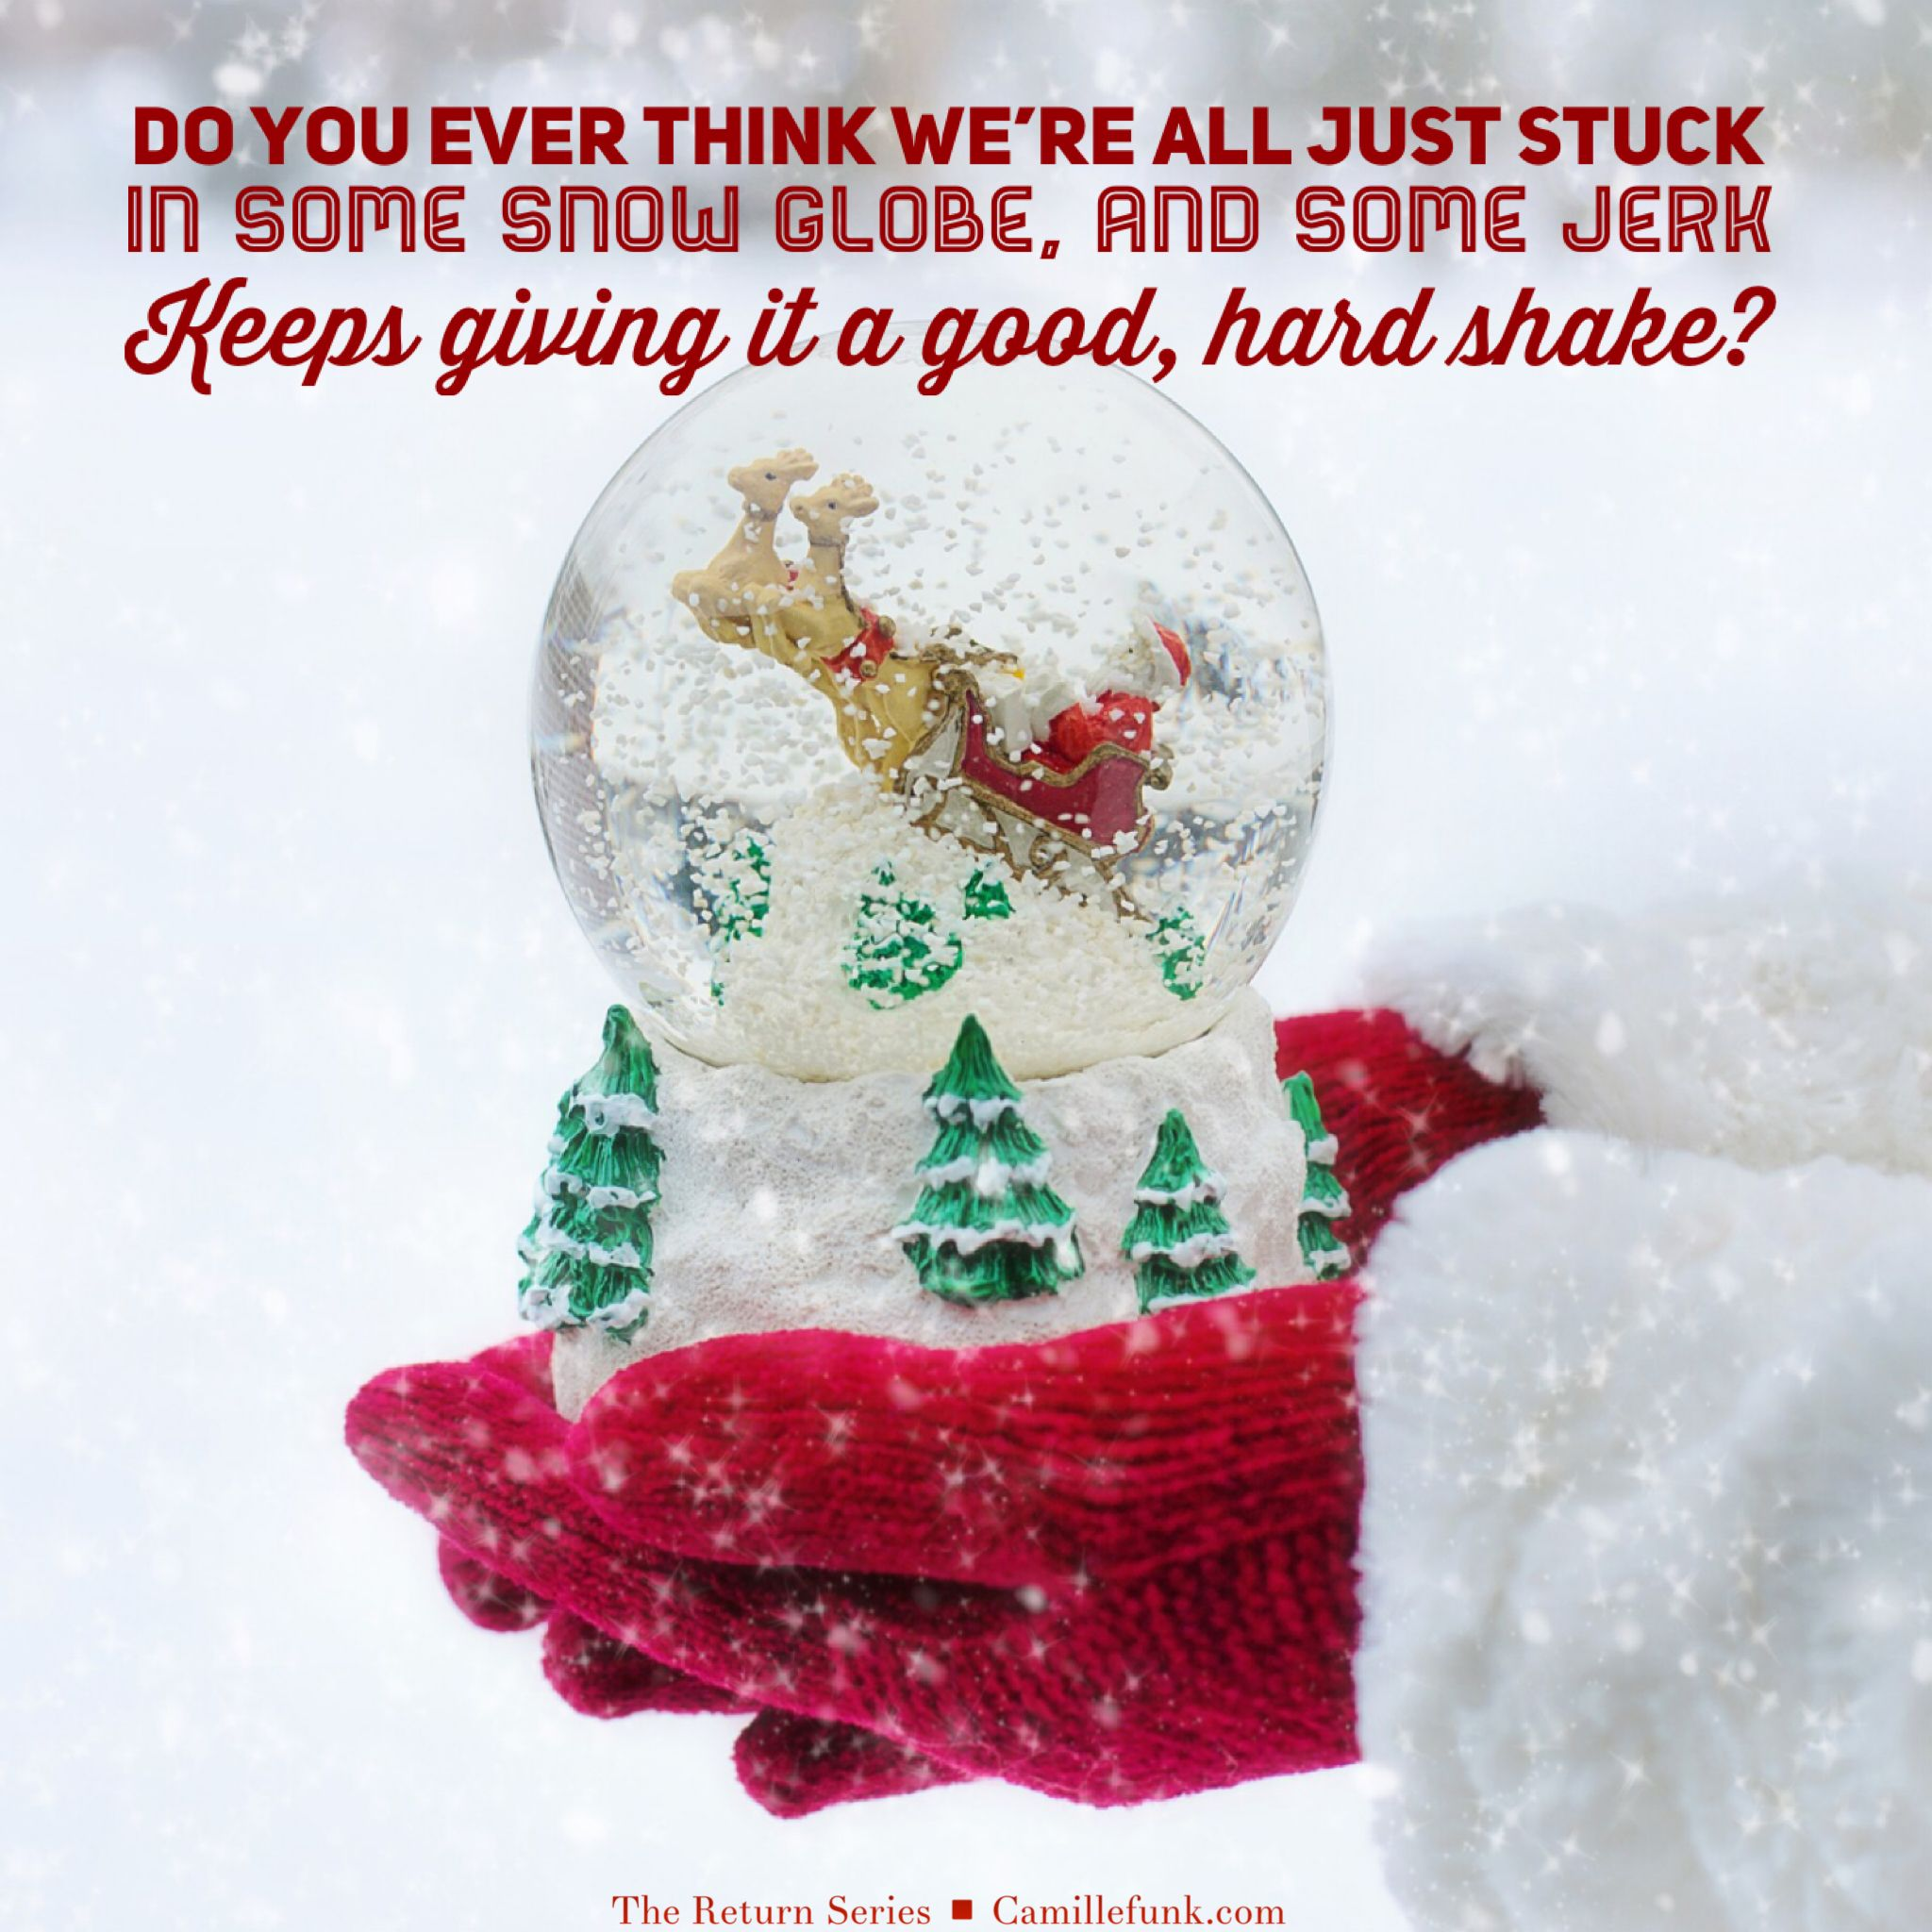 The Return Series Cfunk Sarcastic Quotes Funny Quotes Snow Globes